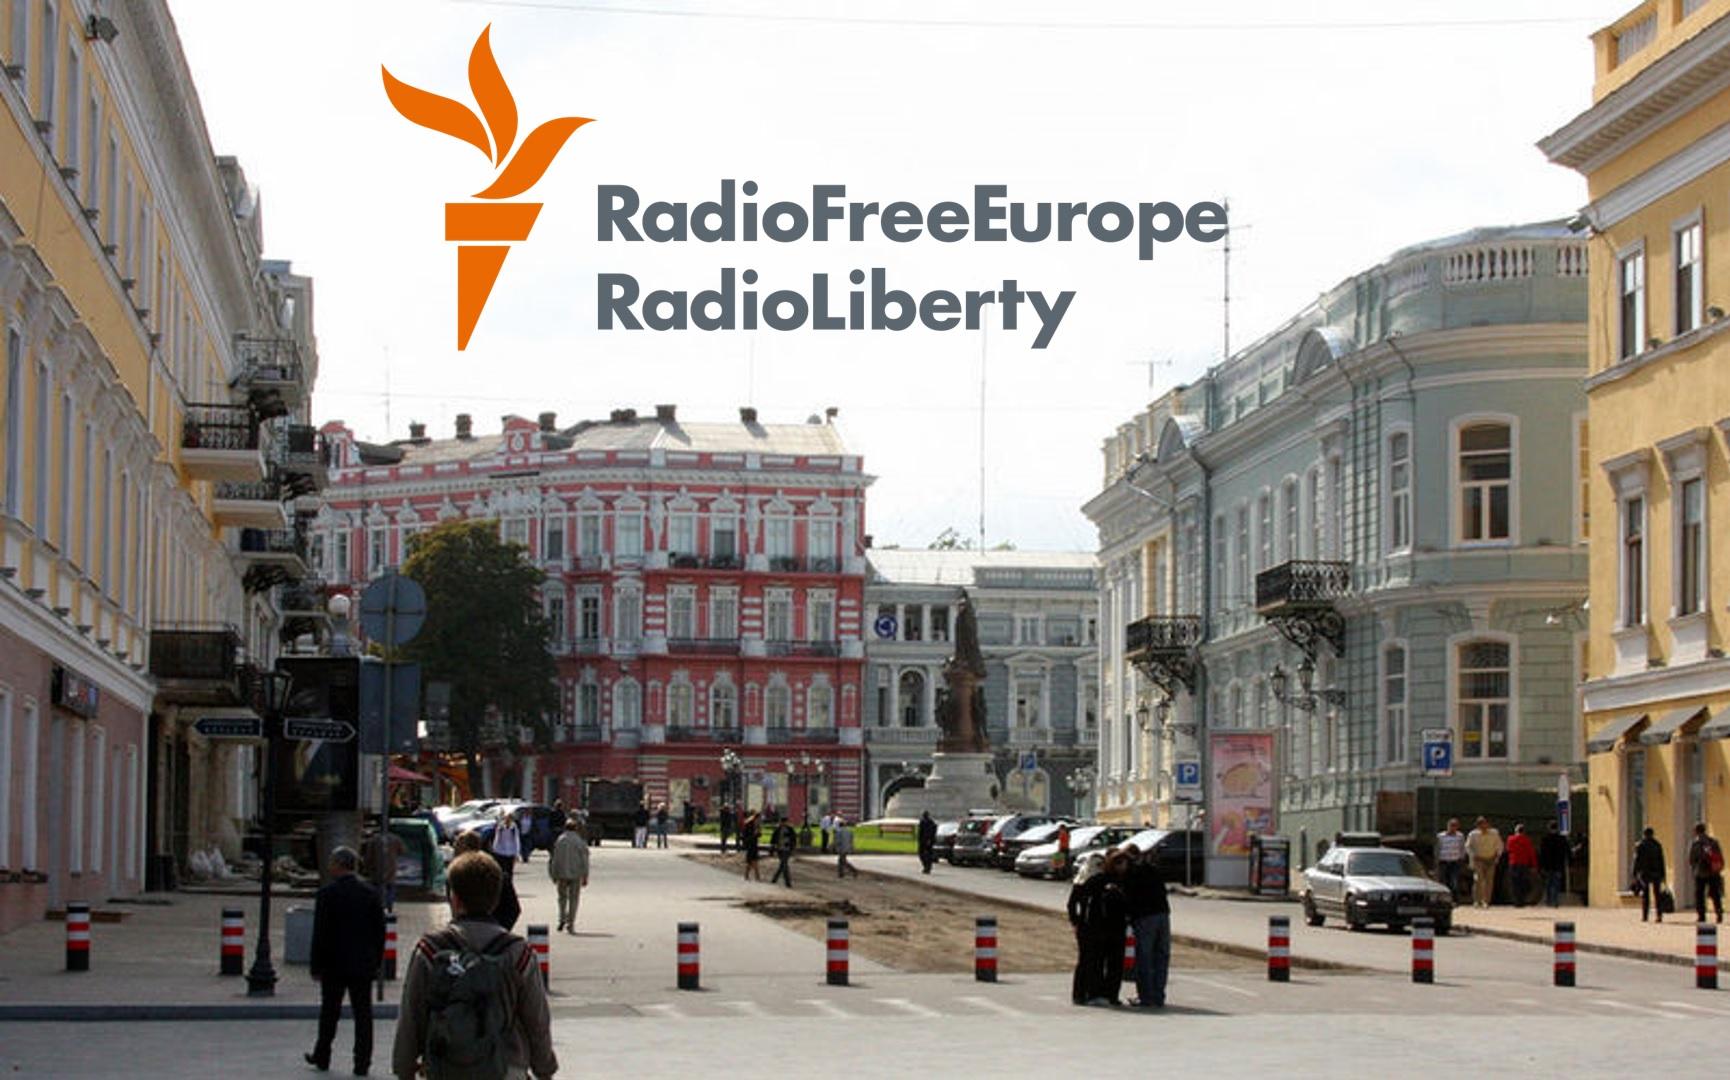 Odessa criticized over high levels of corruption